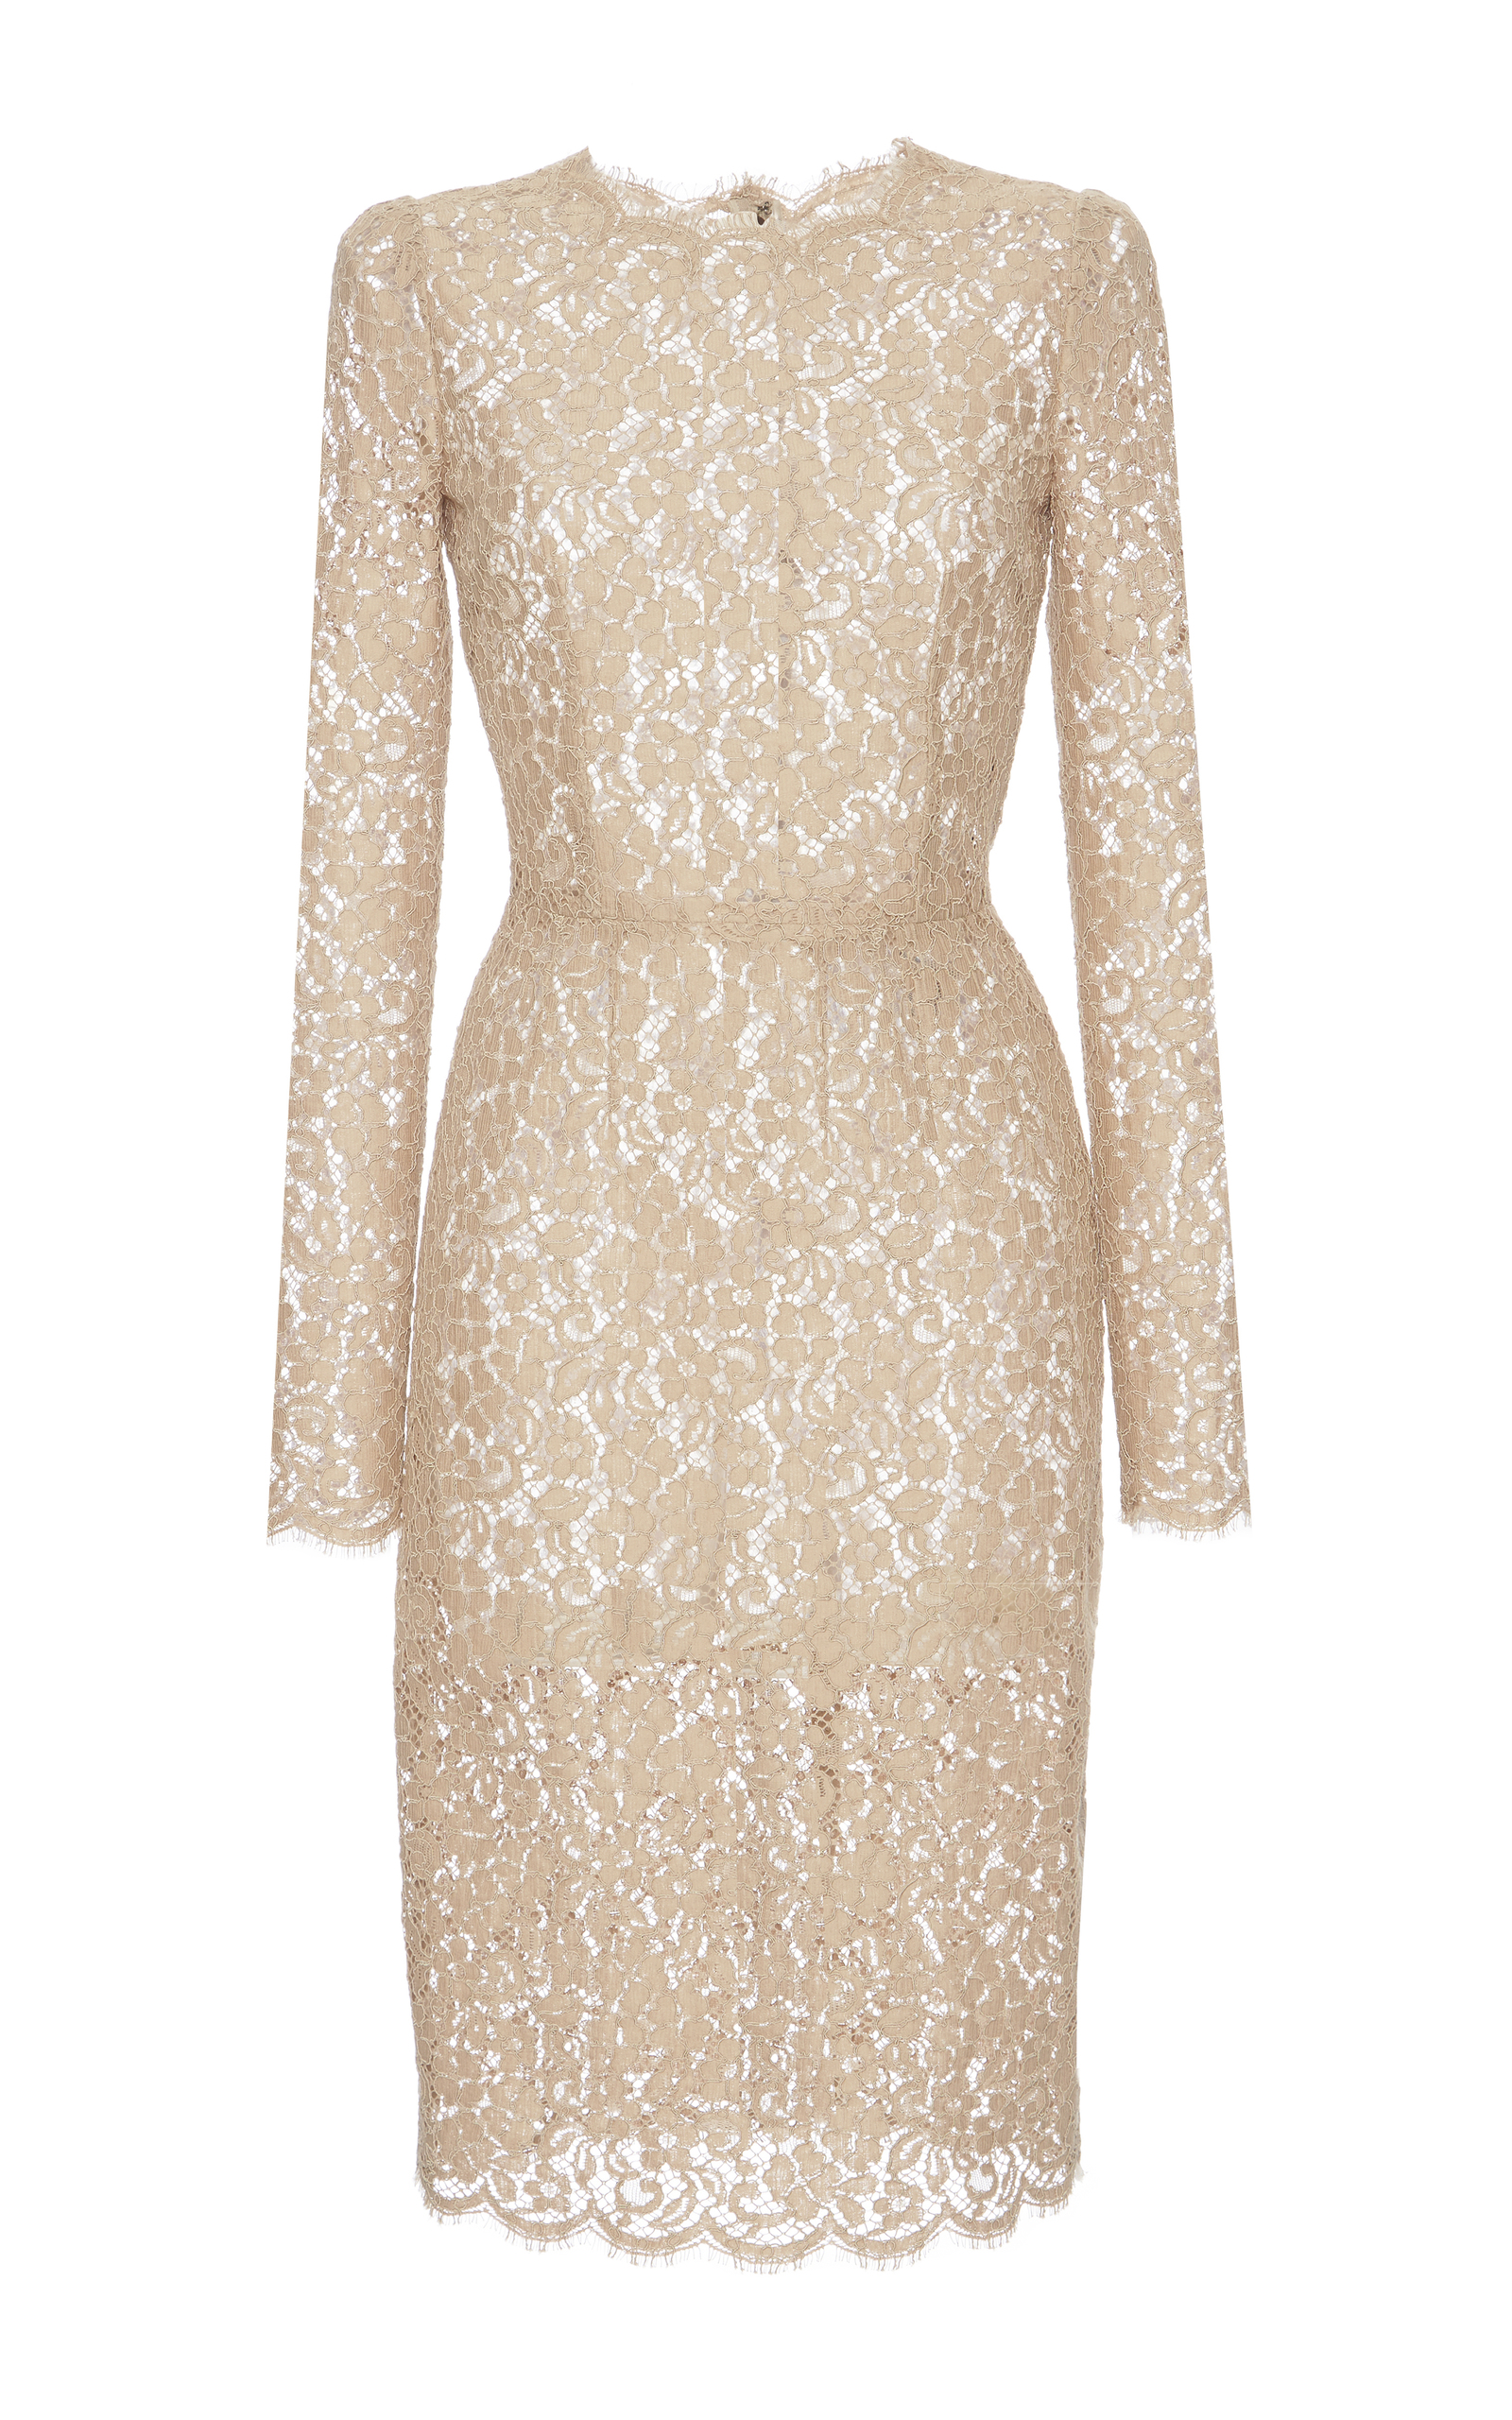 Marica lace dresses